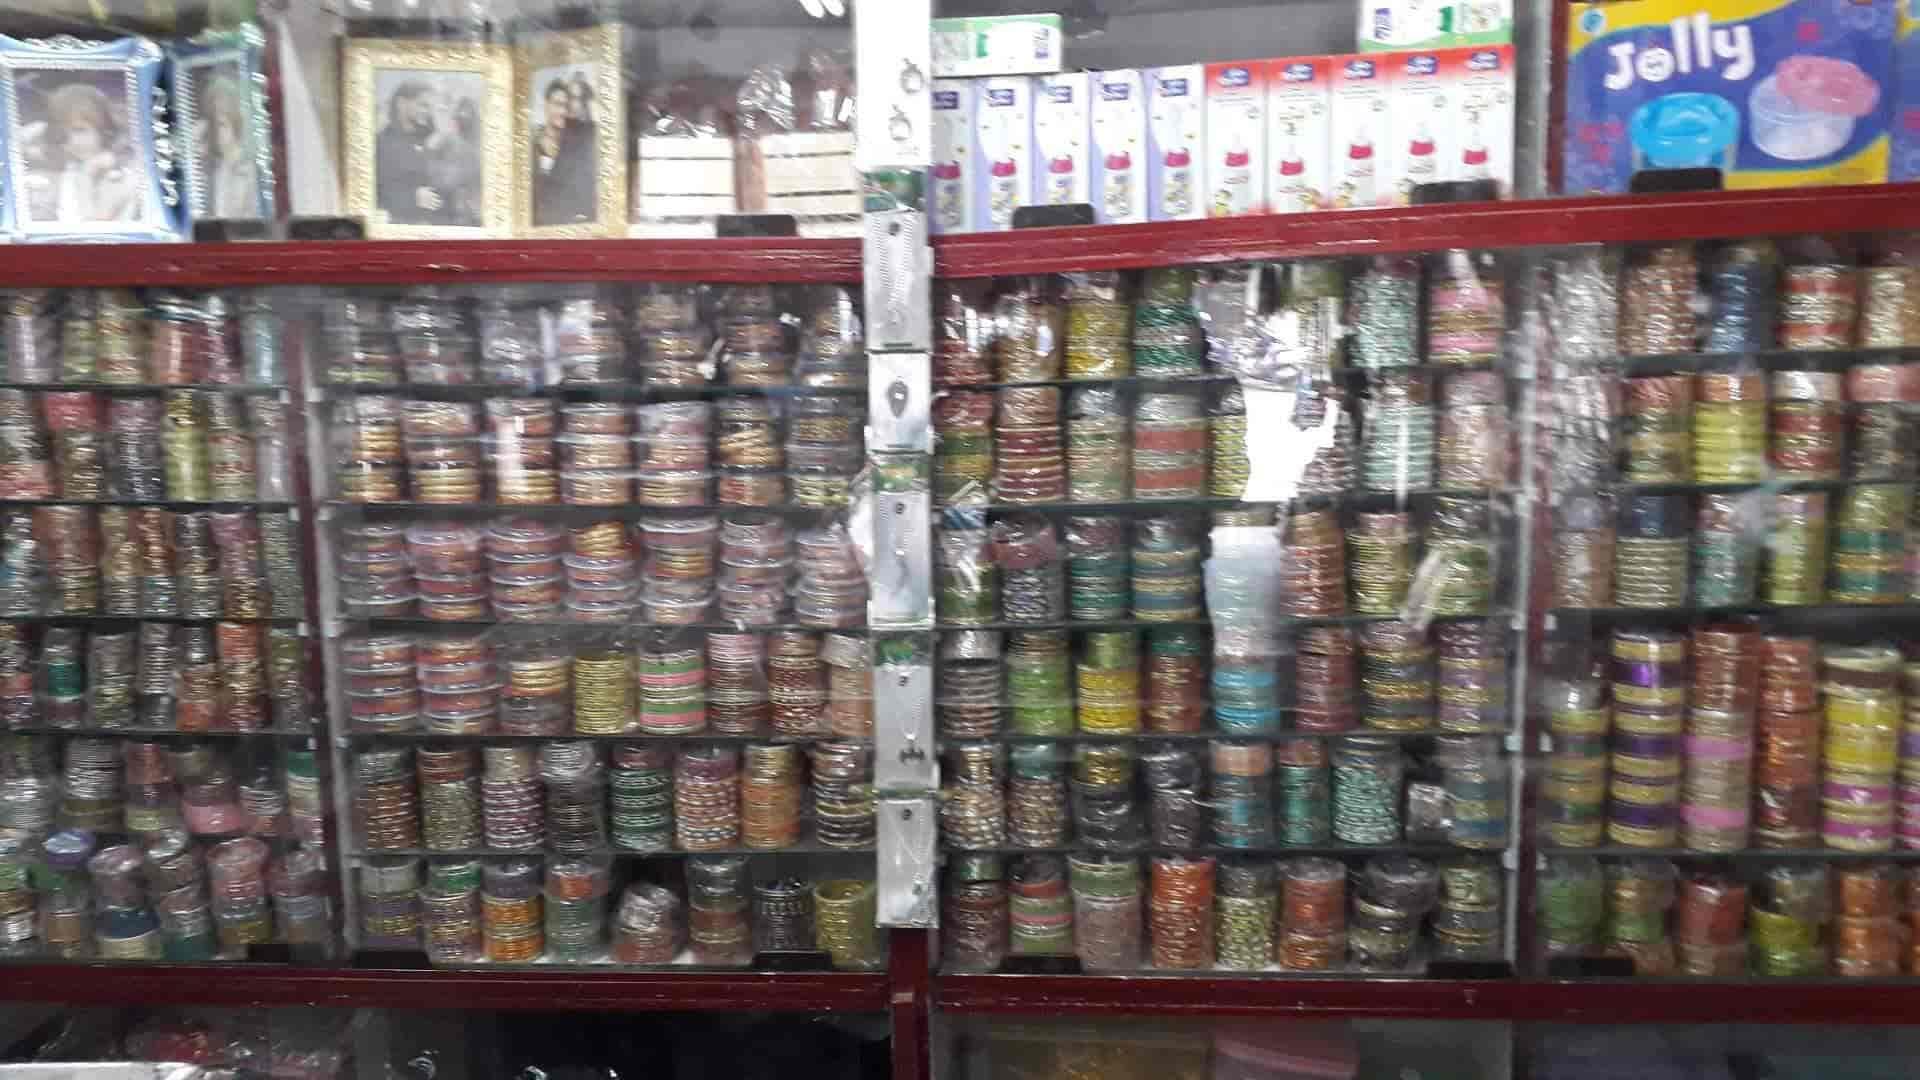 Malar Fancy & Gift, Velippalayam - Gift Shops in Nagapattinam - Justdial